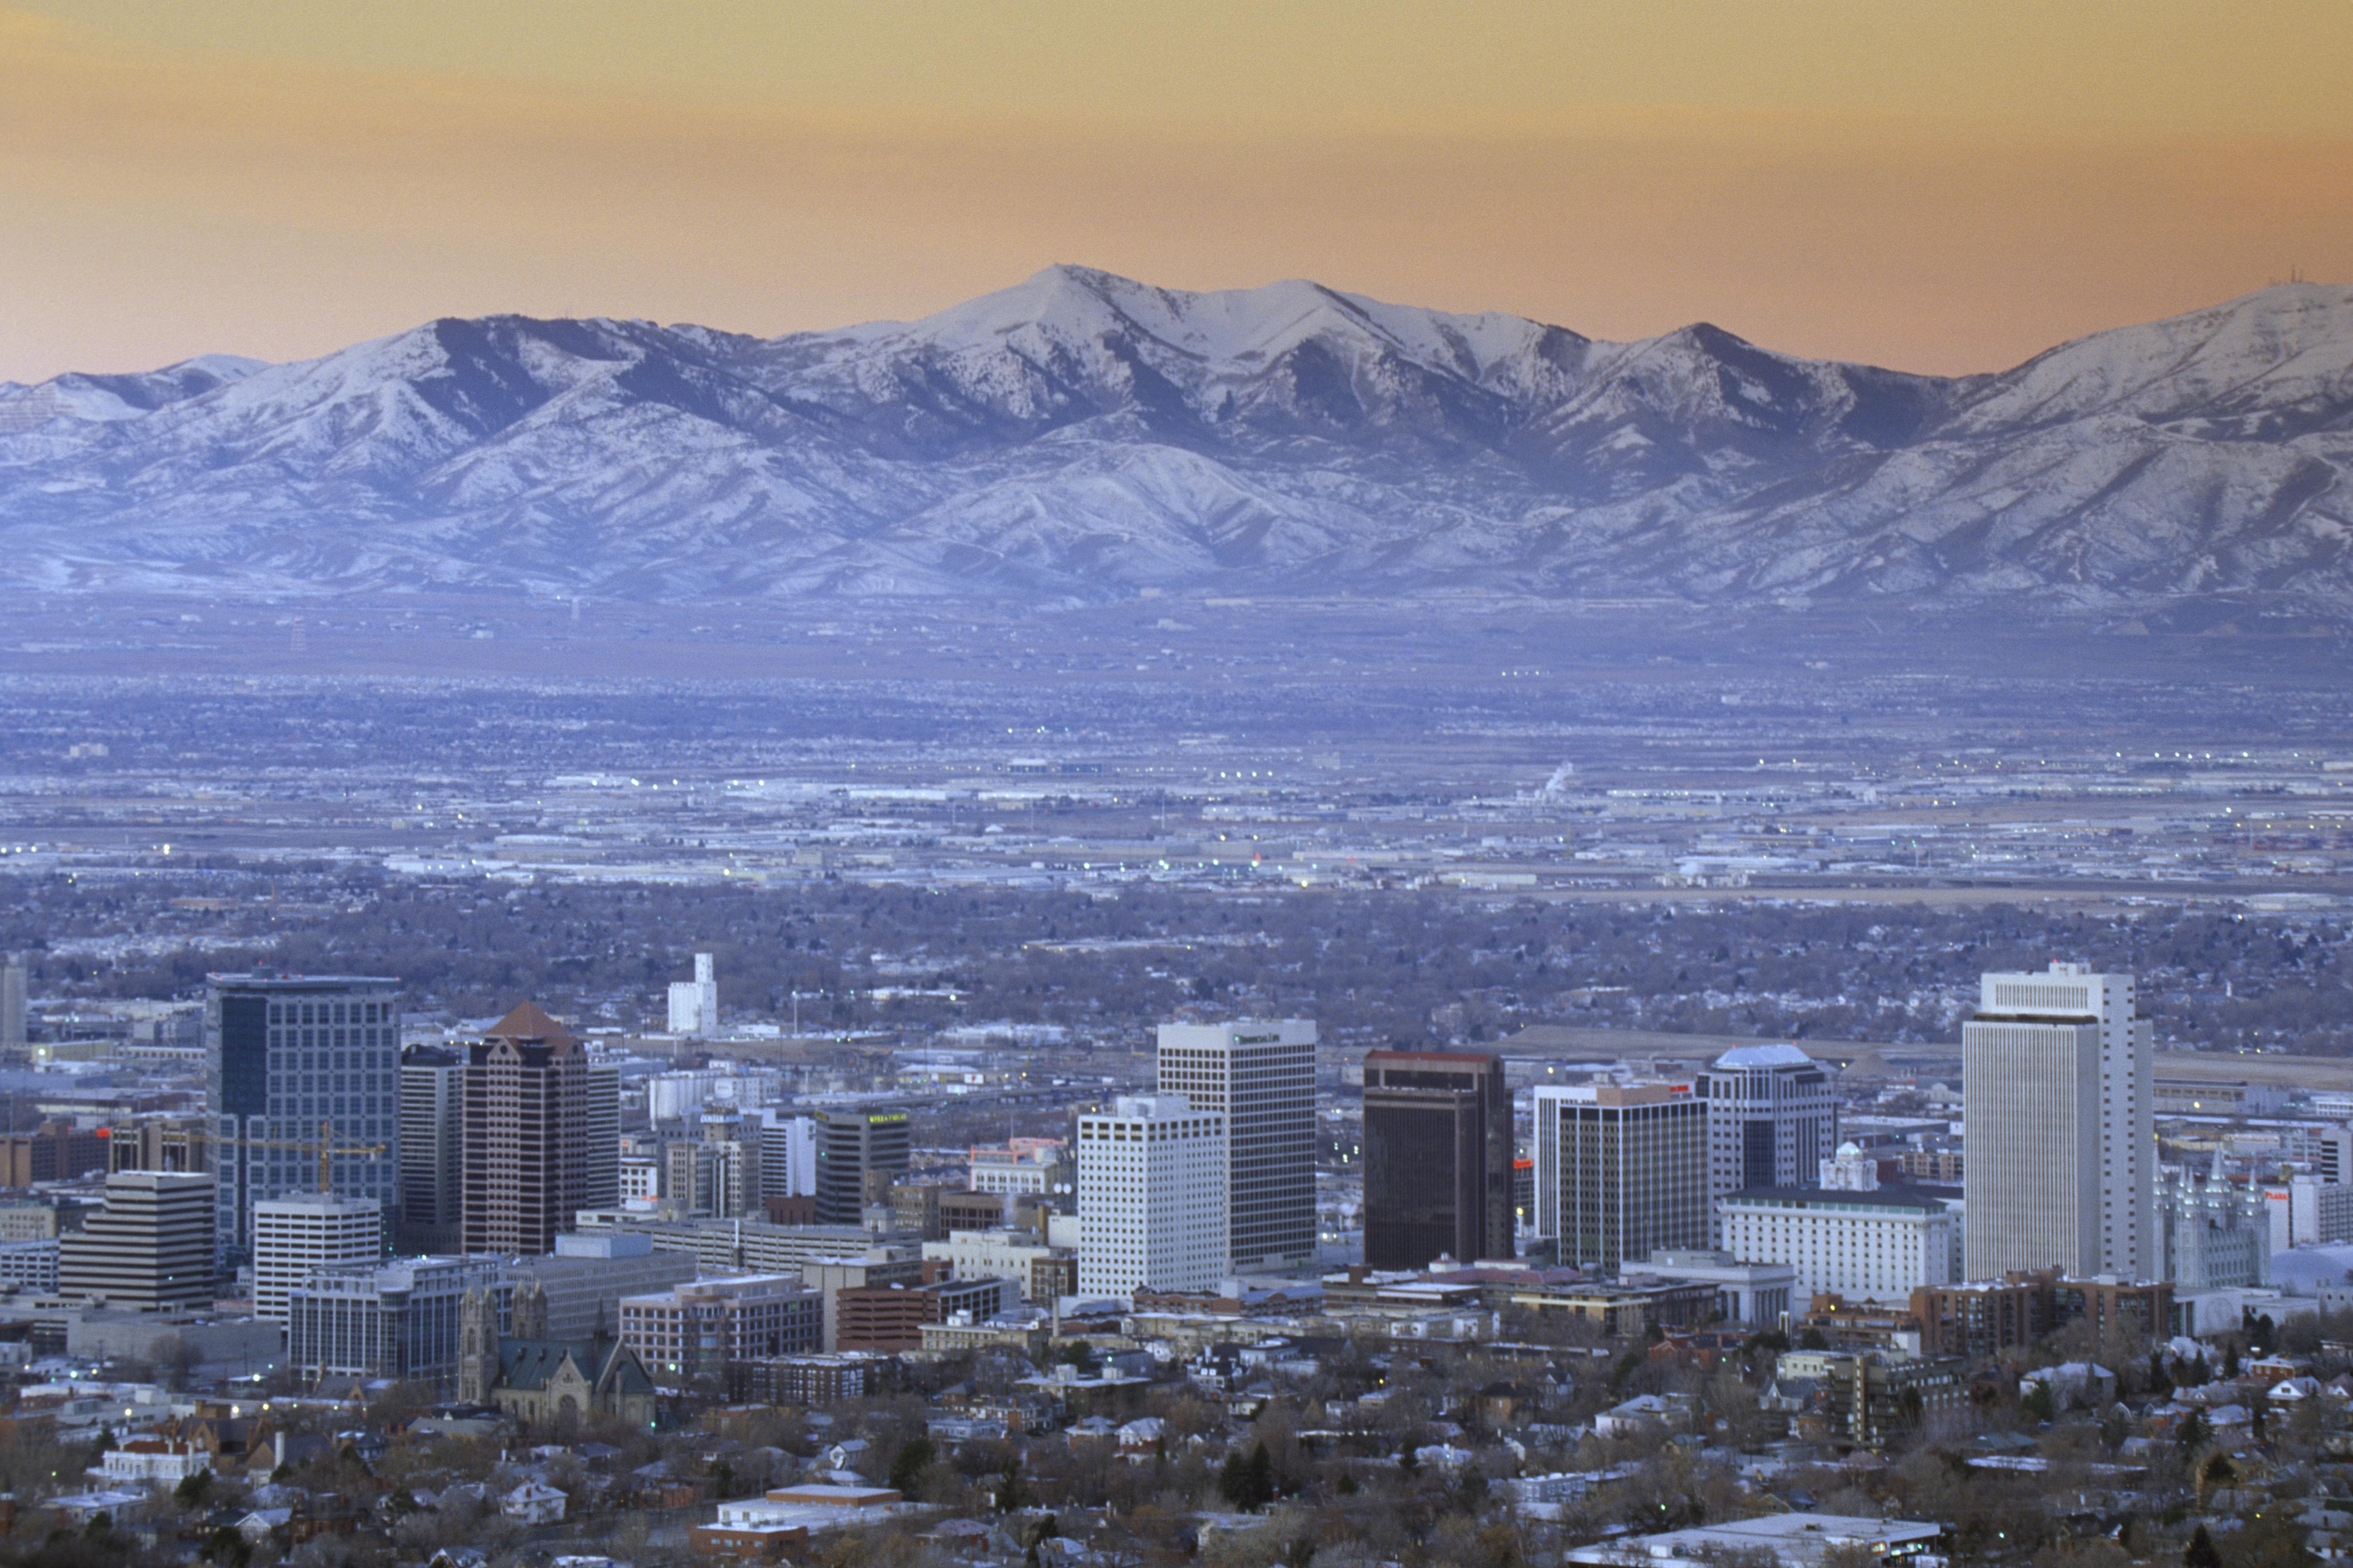 Skyline of Salt Lake City, UT